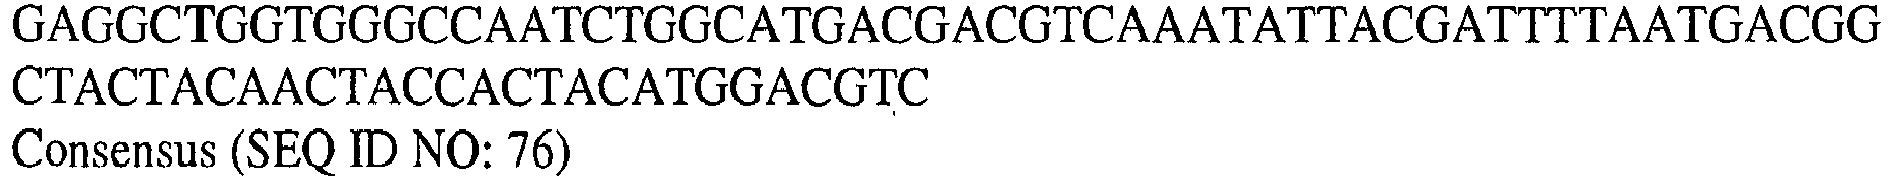 Figure imgb0446